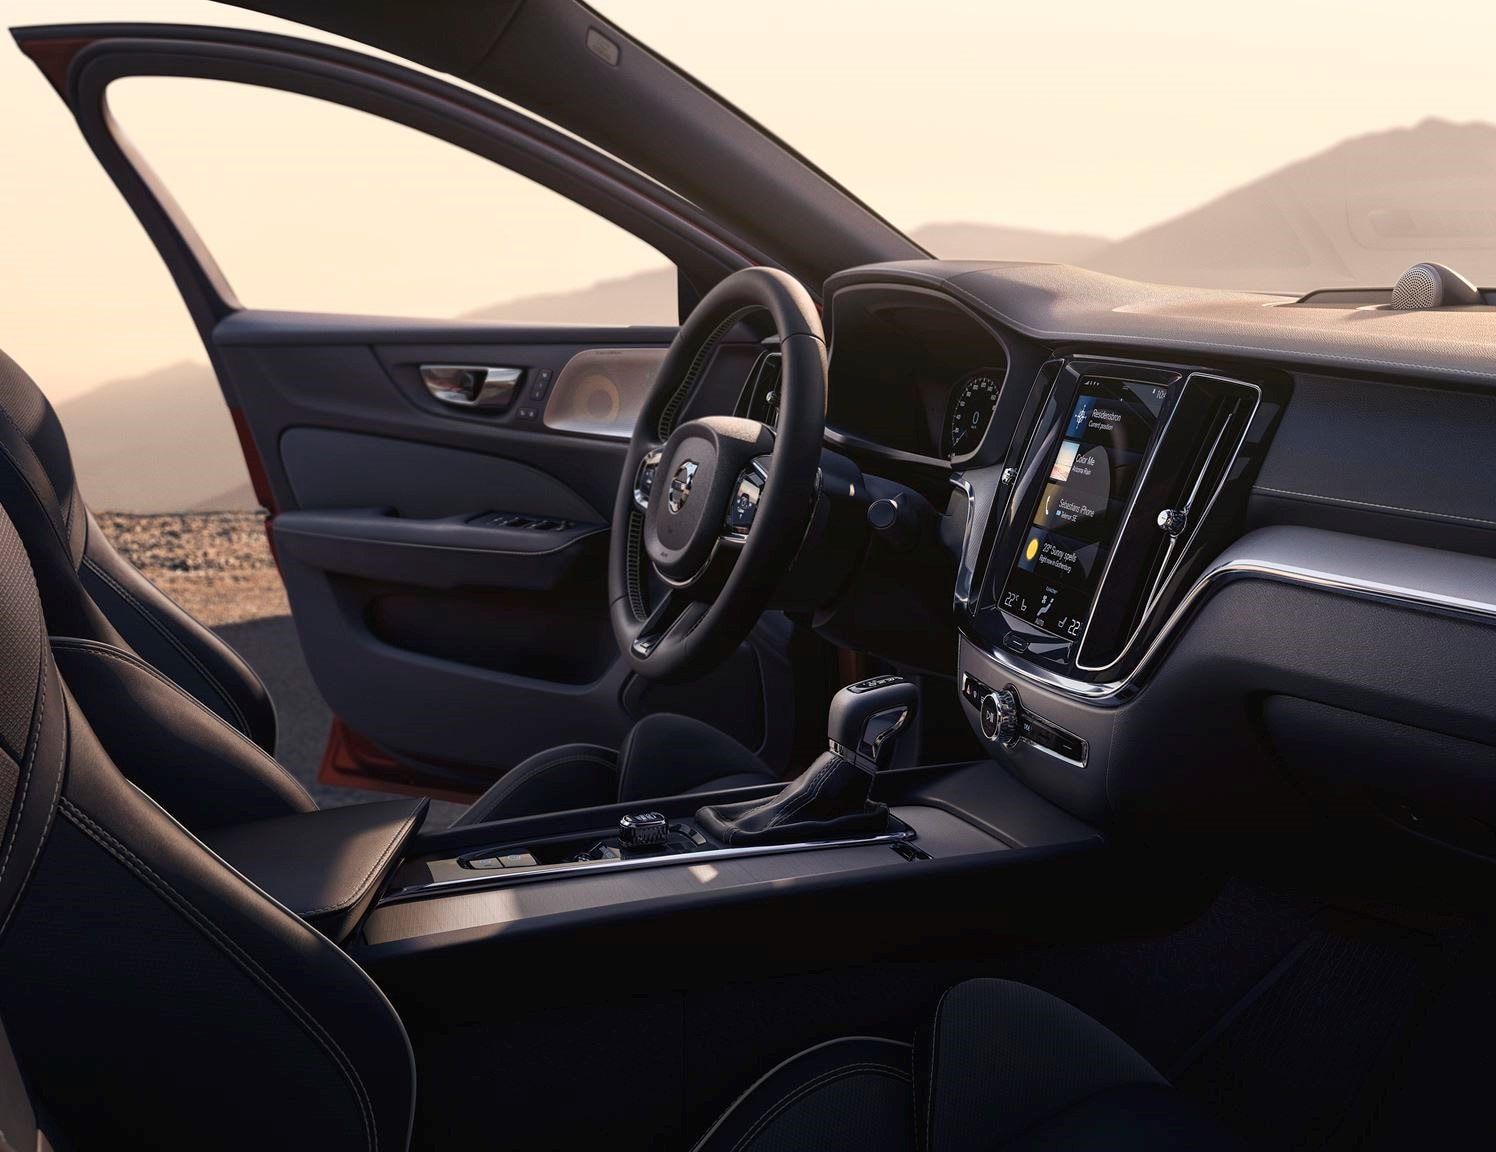 All-new Luxury Sedan | Volvo Cars Keene | New and Used Volvo dealership in Keene, NH 03431